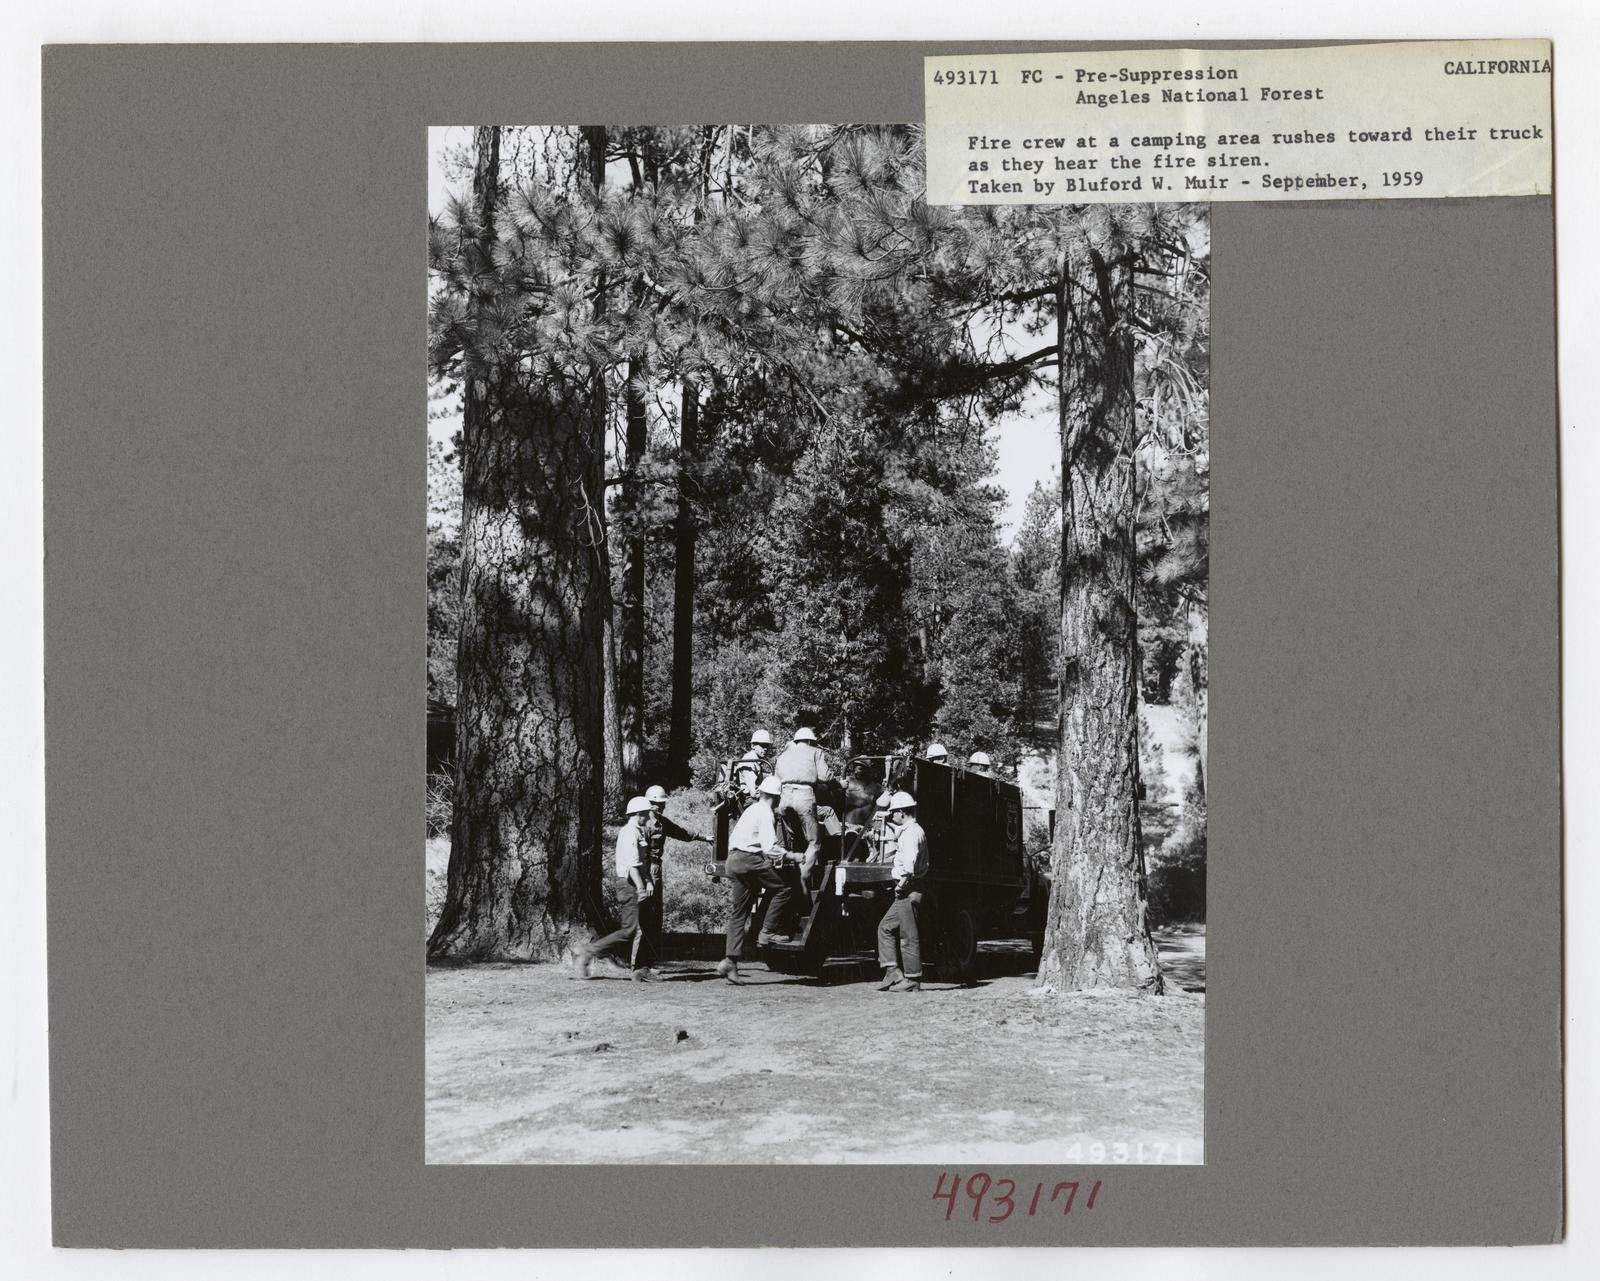 Transportation to Fires - California